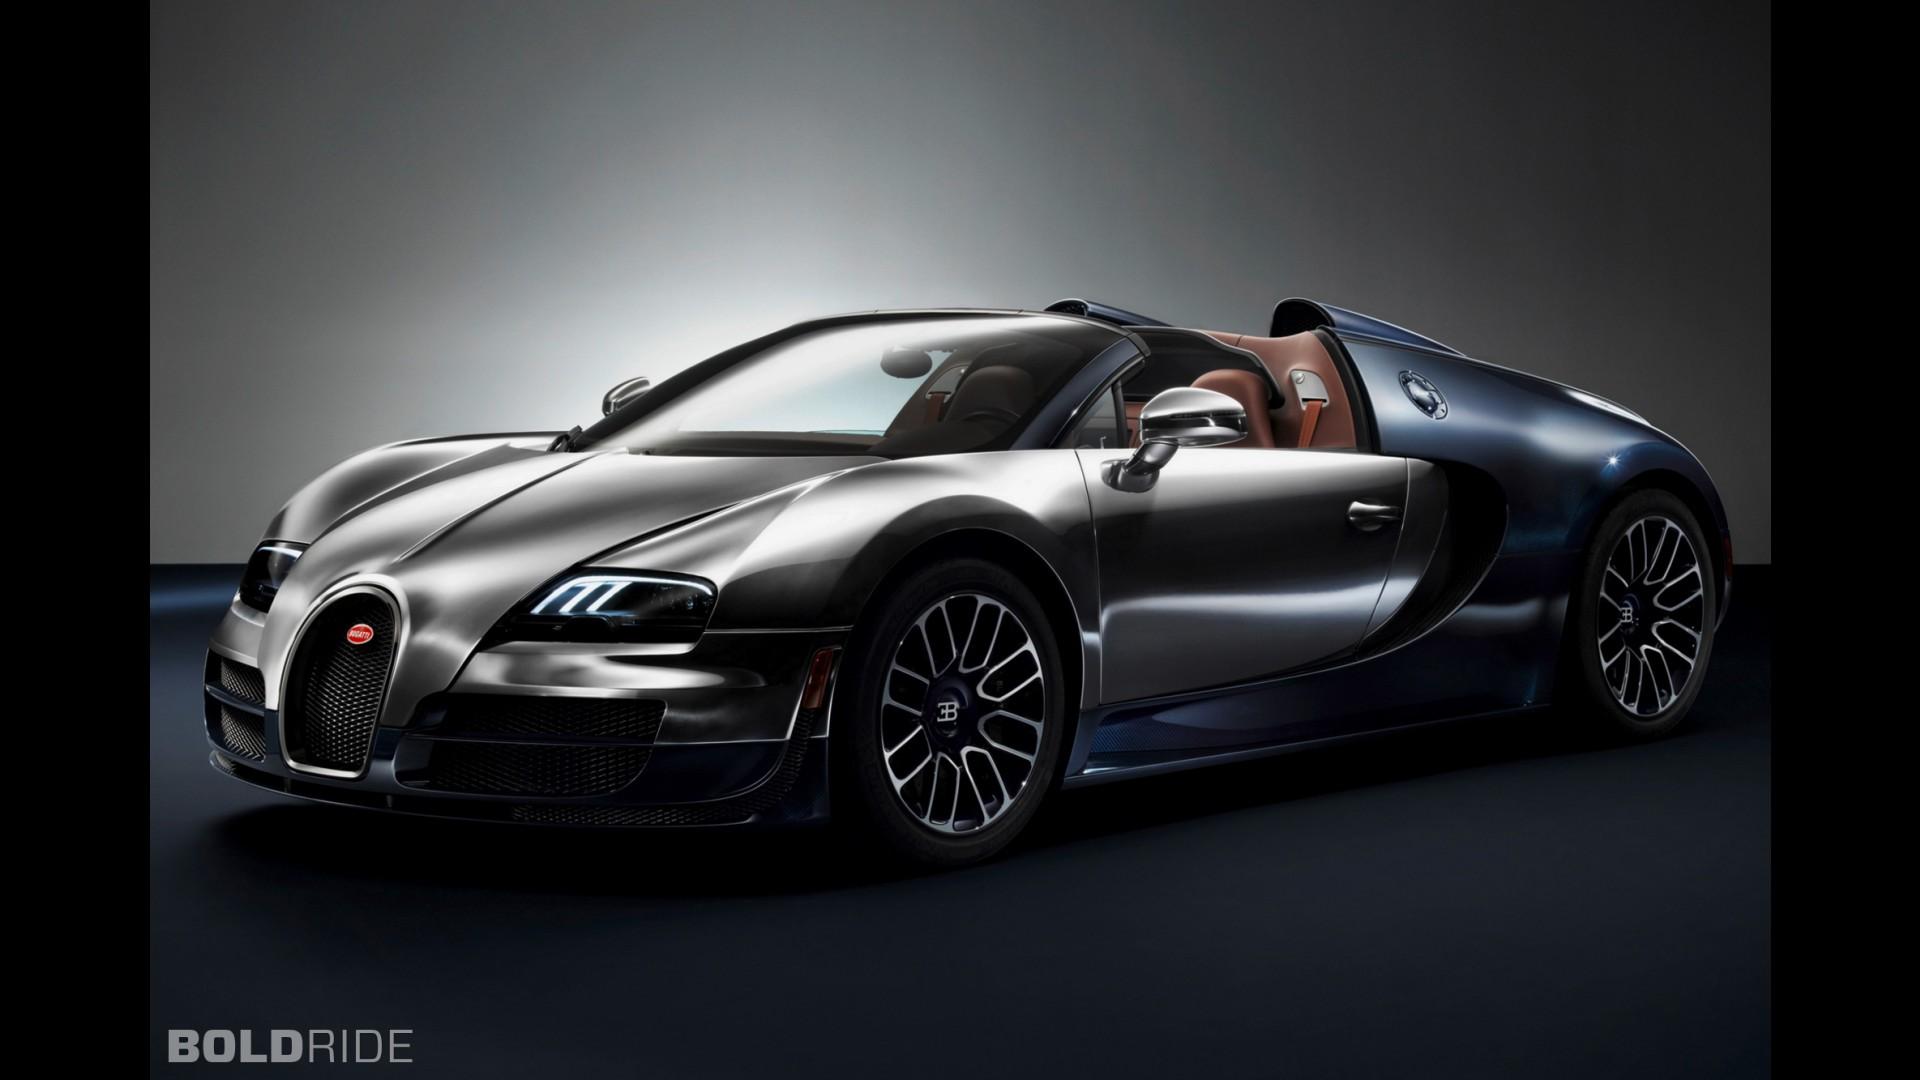 bugatti-veyron-grand-sport-vitesse-legend-ettore-bugatti Stunning Bugatti Veyron 16.4 Grand Sport Vitesse Interior Cars Trend